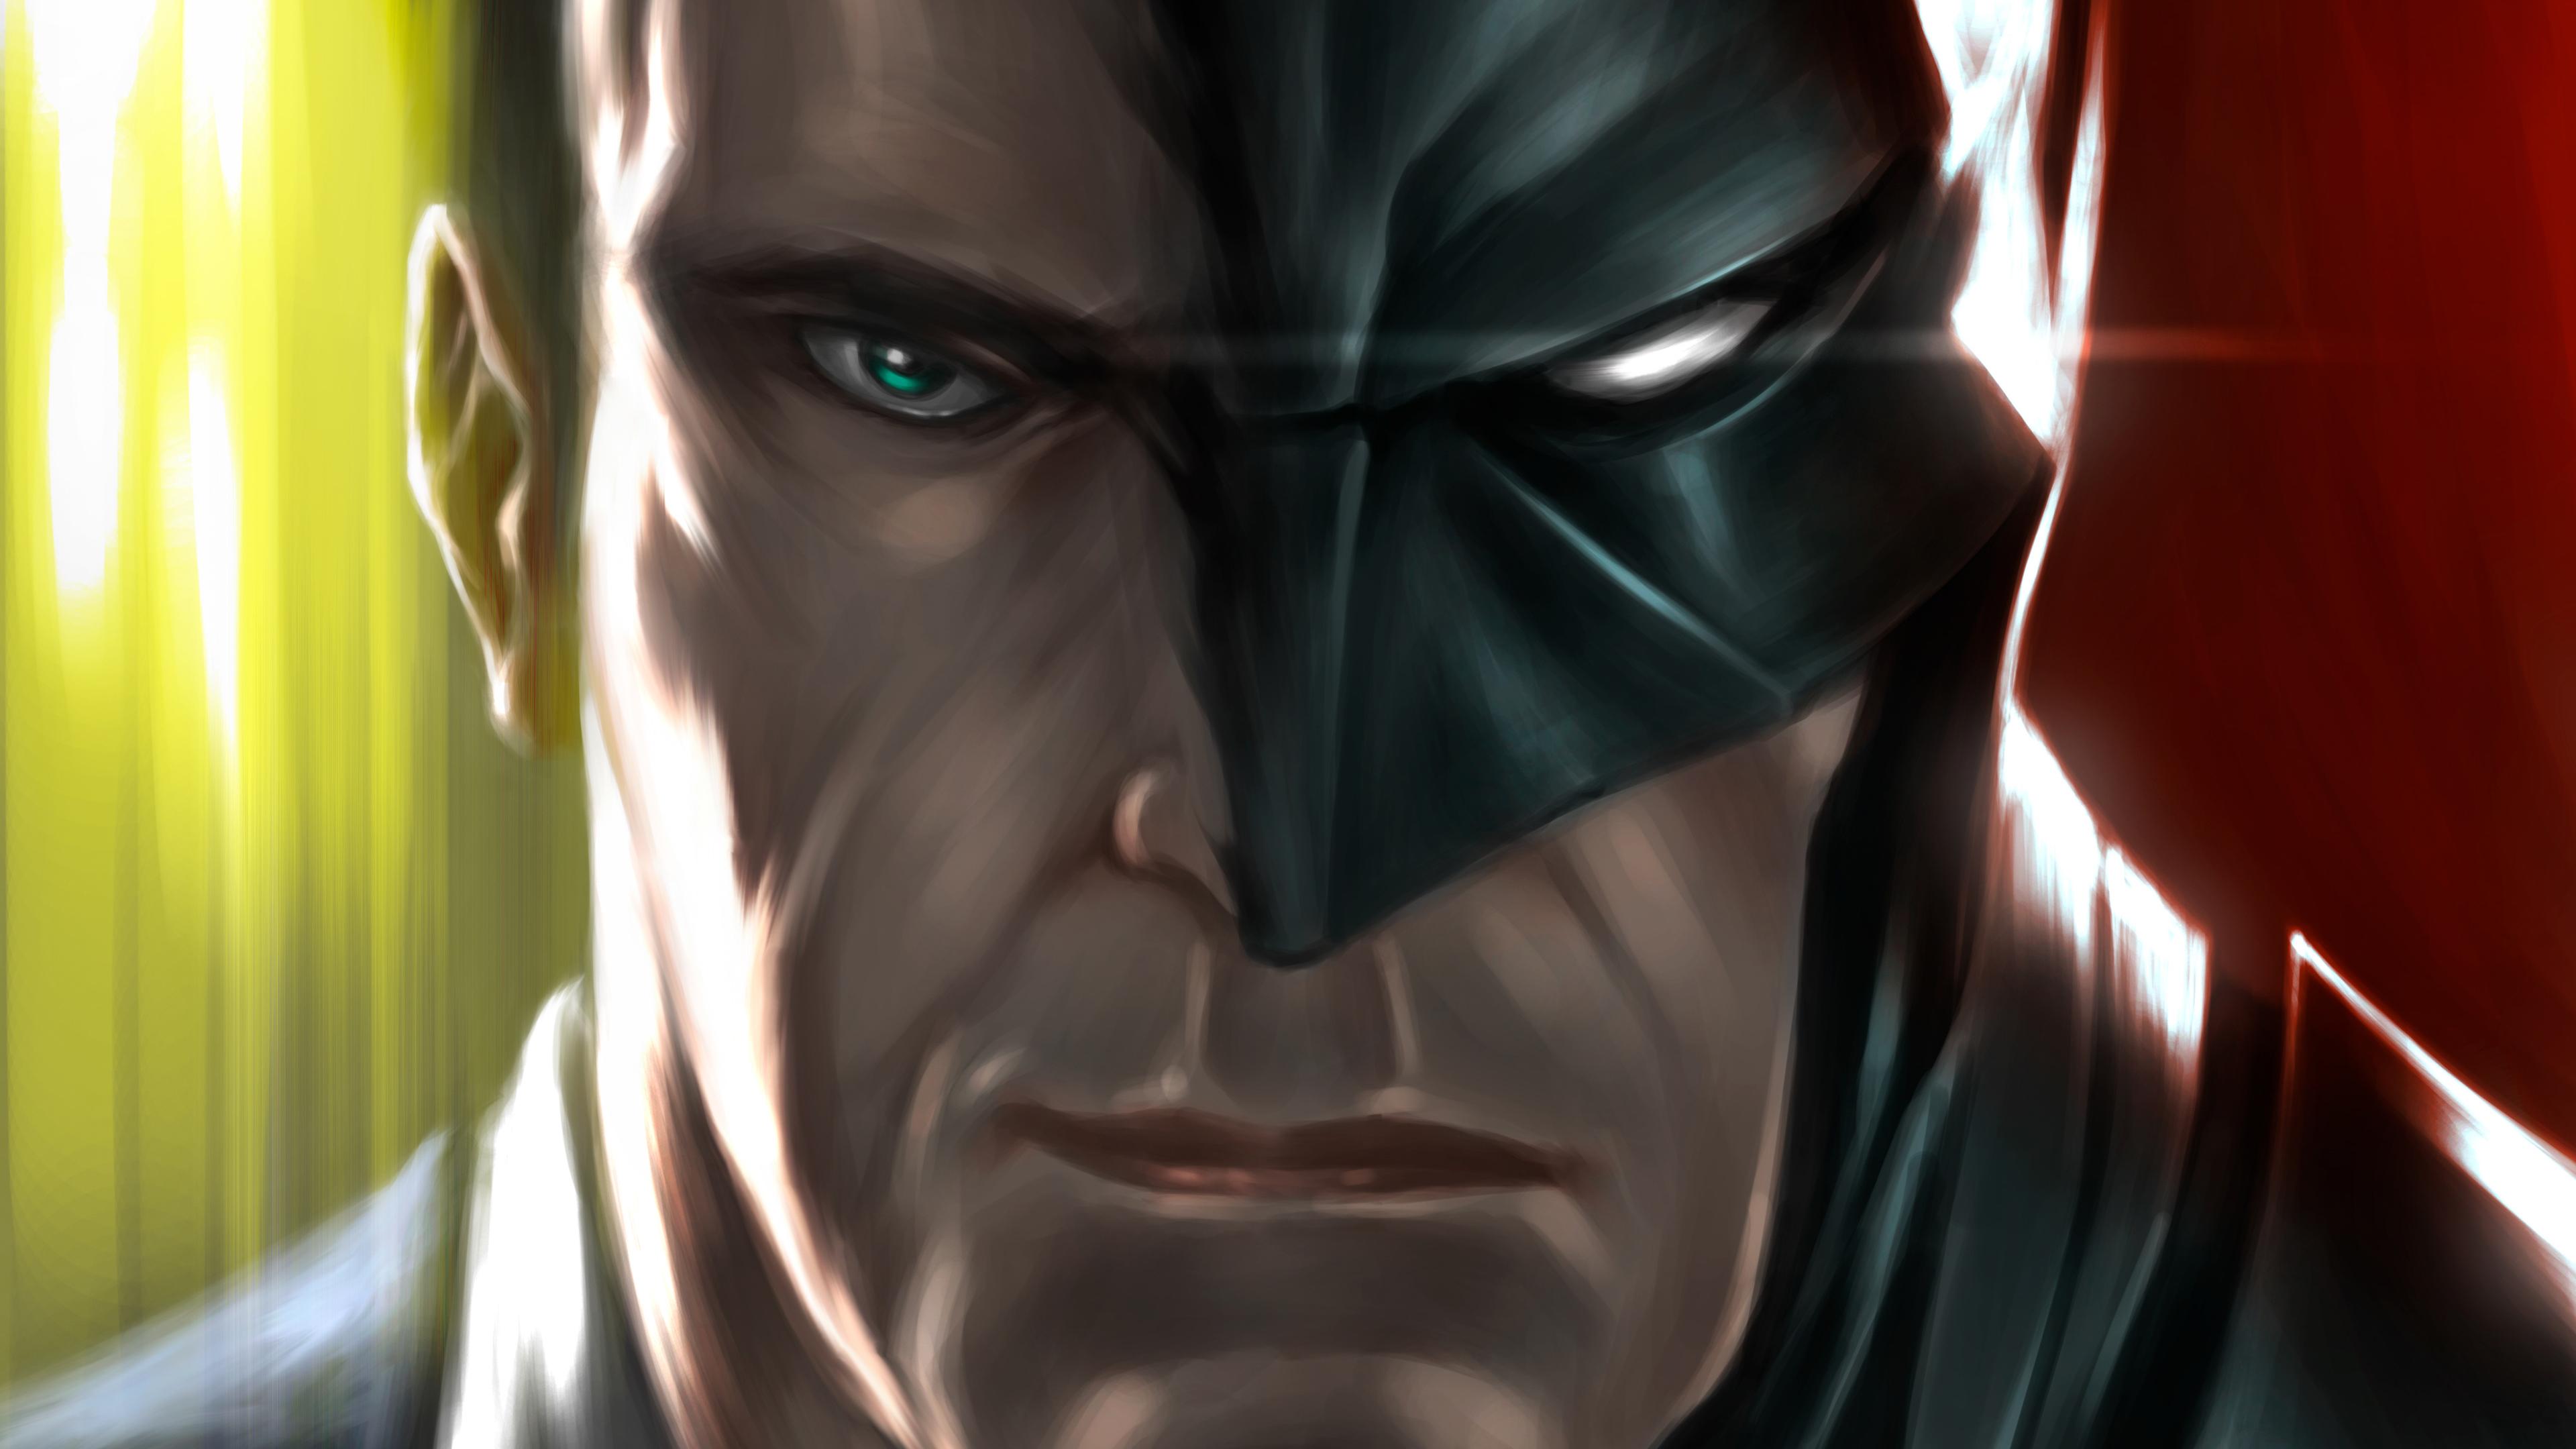 batman arkham knight tribute 4k 1547506291 - Batman Arkham Knight Tribute 4k - superheroes wallpapers, hd-wallpapers, digital art wallpapers, behance wallpapers, batman wallpapers, artwork wallpapers, artist wallpapers, 4k-wallpapers